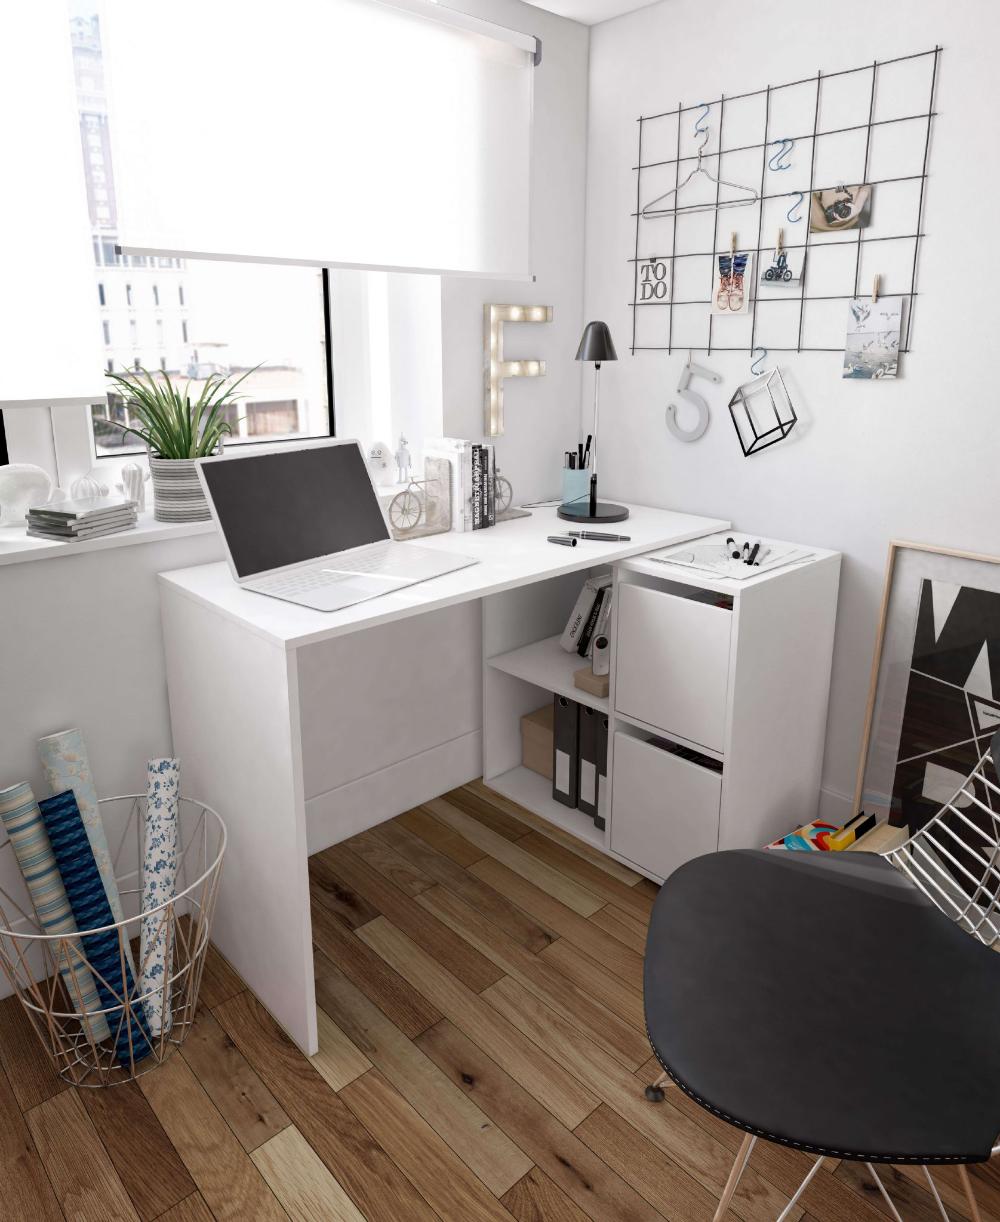 Pin By Aizin On Home Ideas In 2020 White Corner Desk Desks For Small Spaces Modern Corner Desk